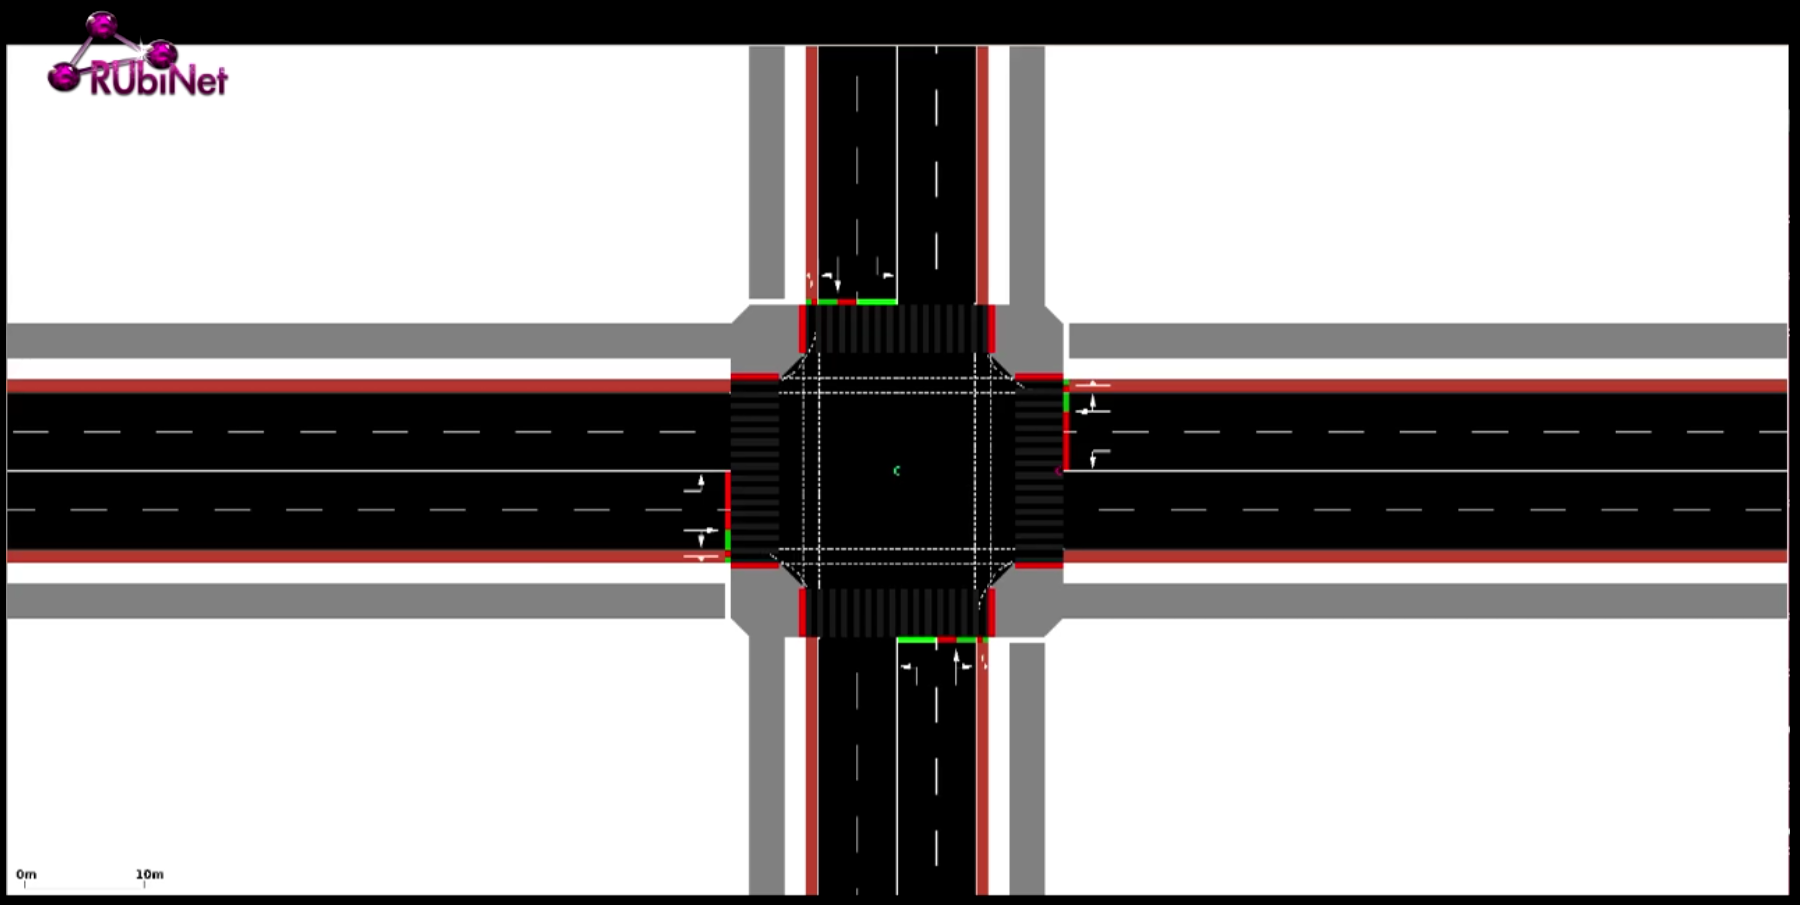 VENTOS - VEhicular NeTwork Open Simulator